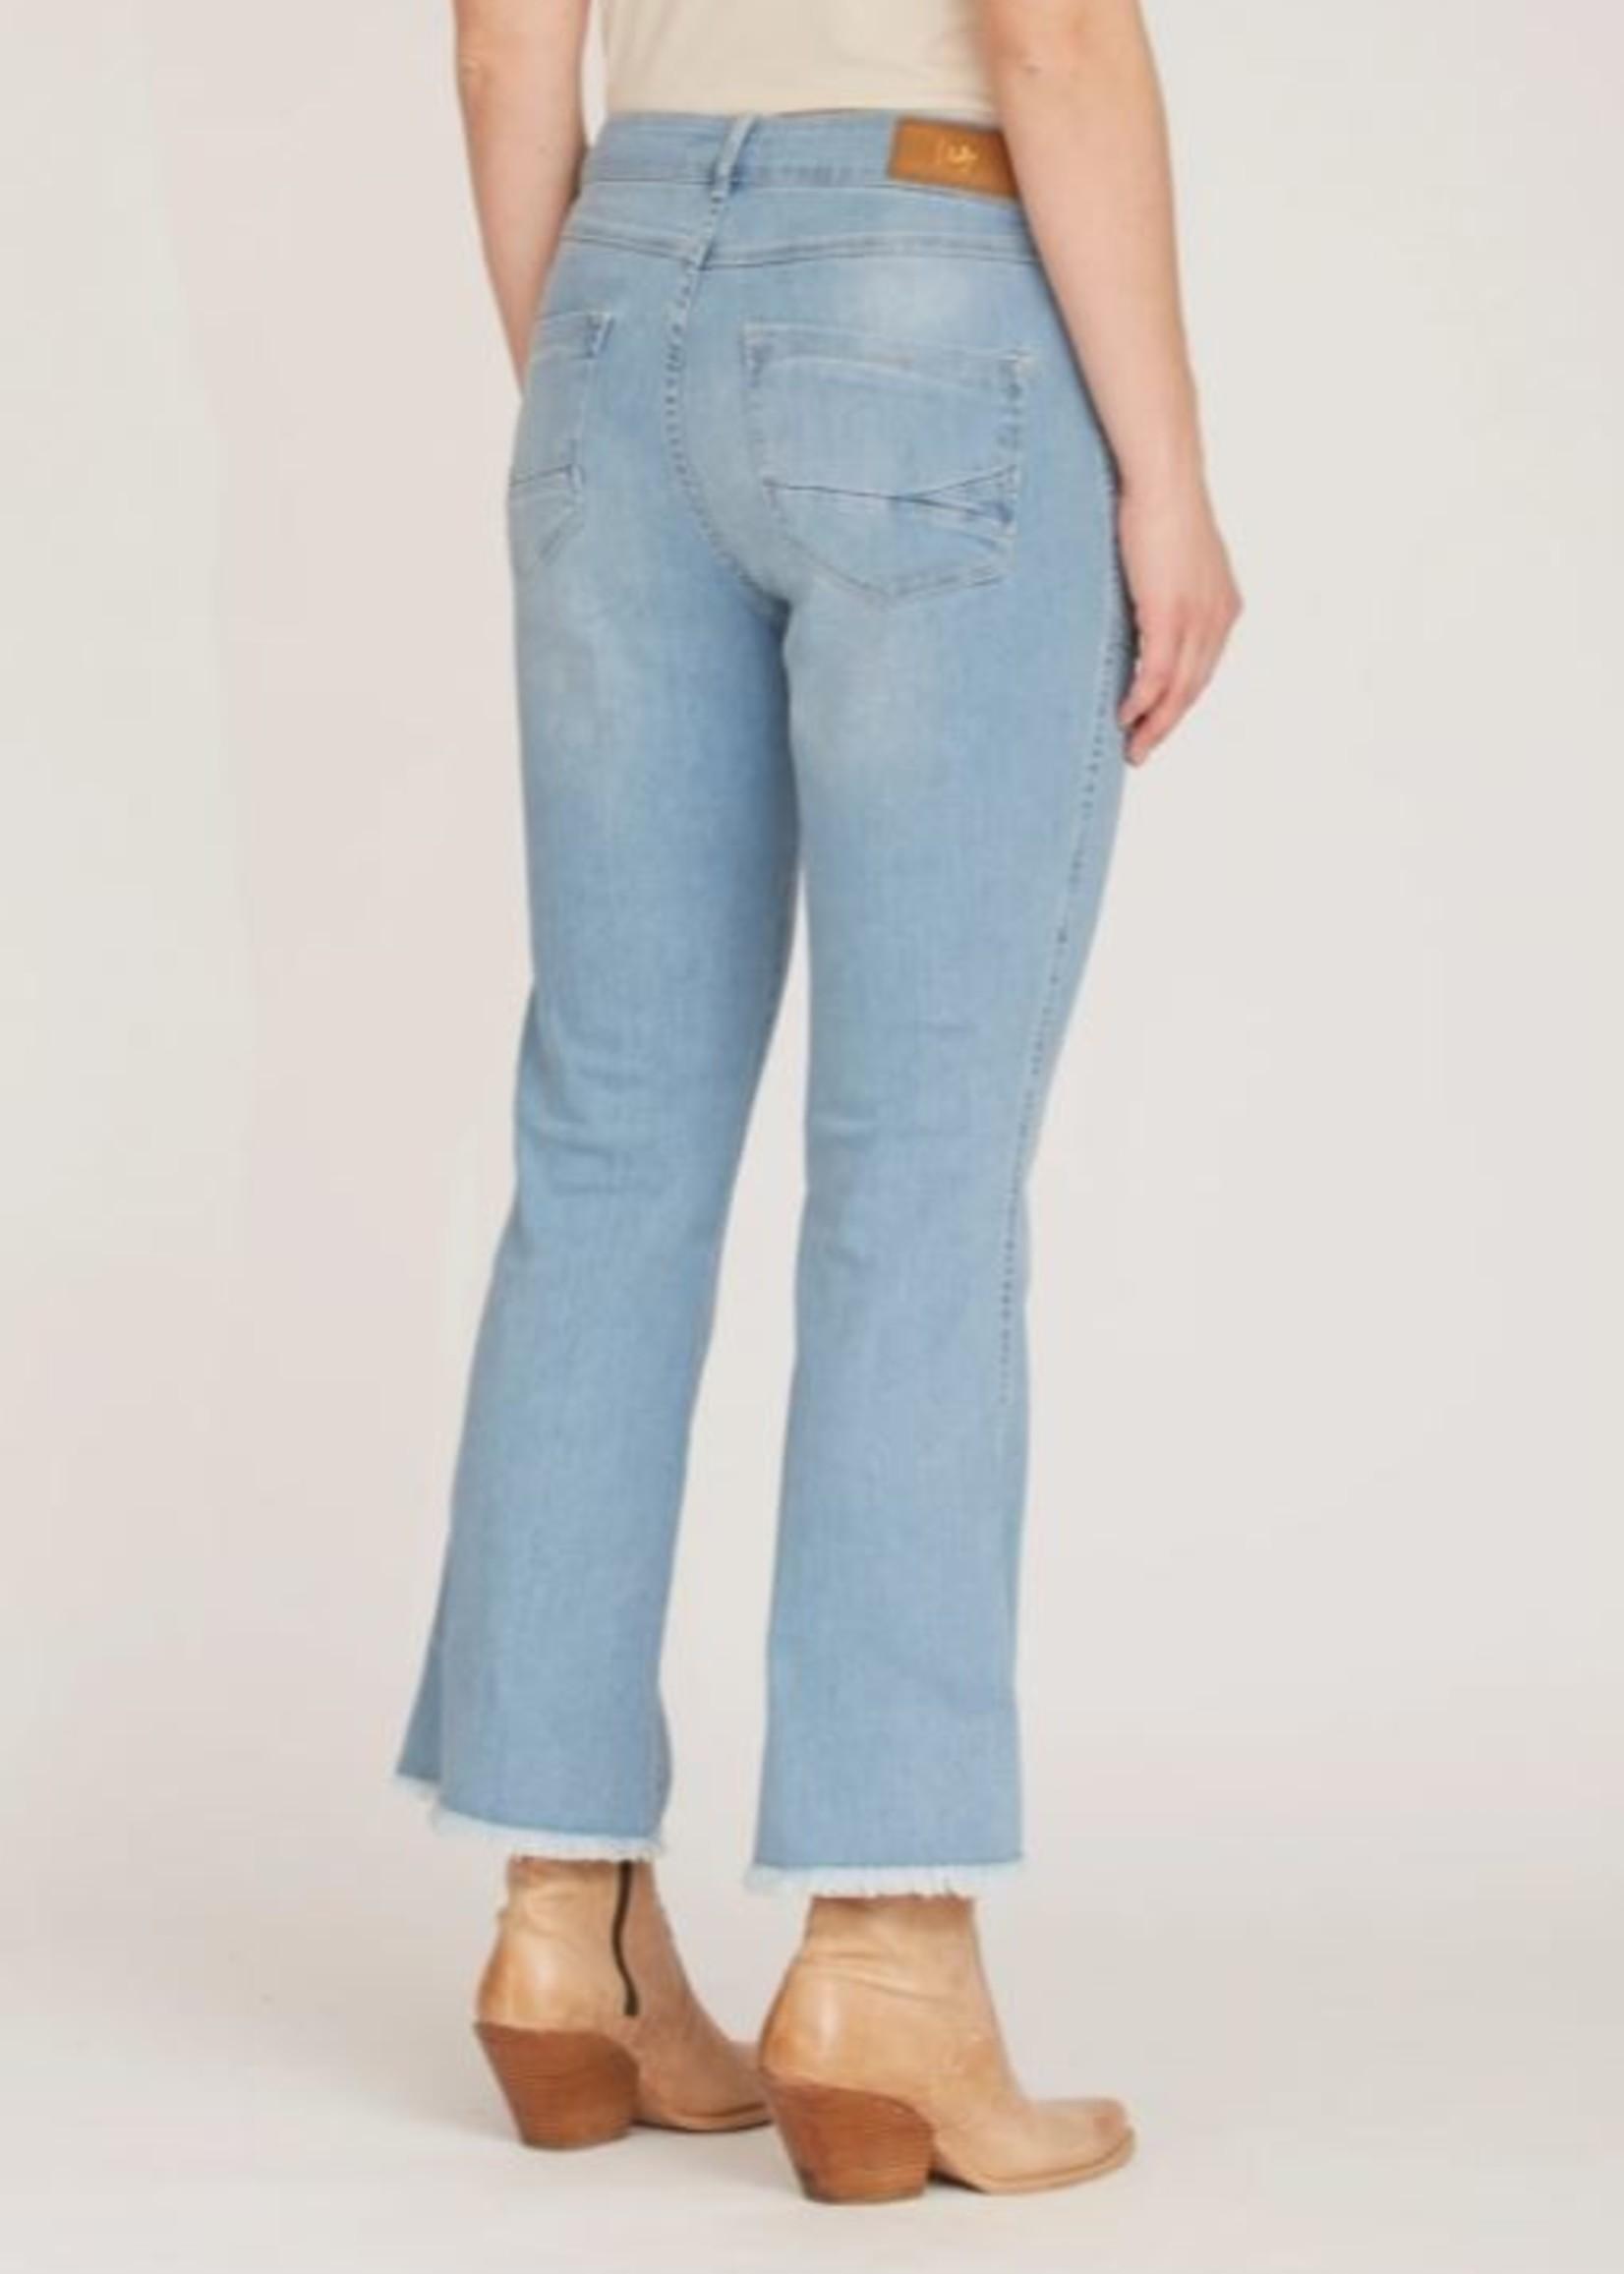 I Say Como Flare Jeans Light Blue Wash